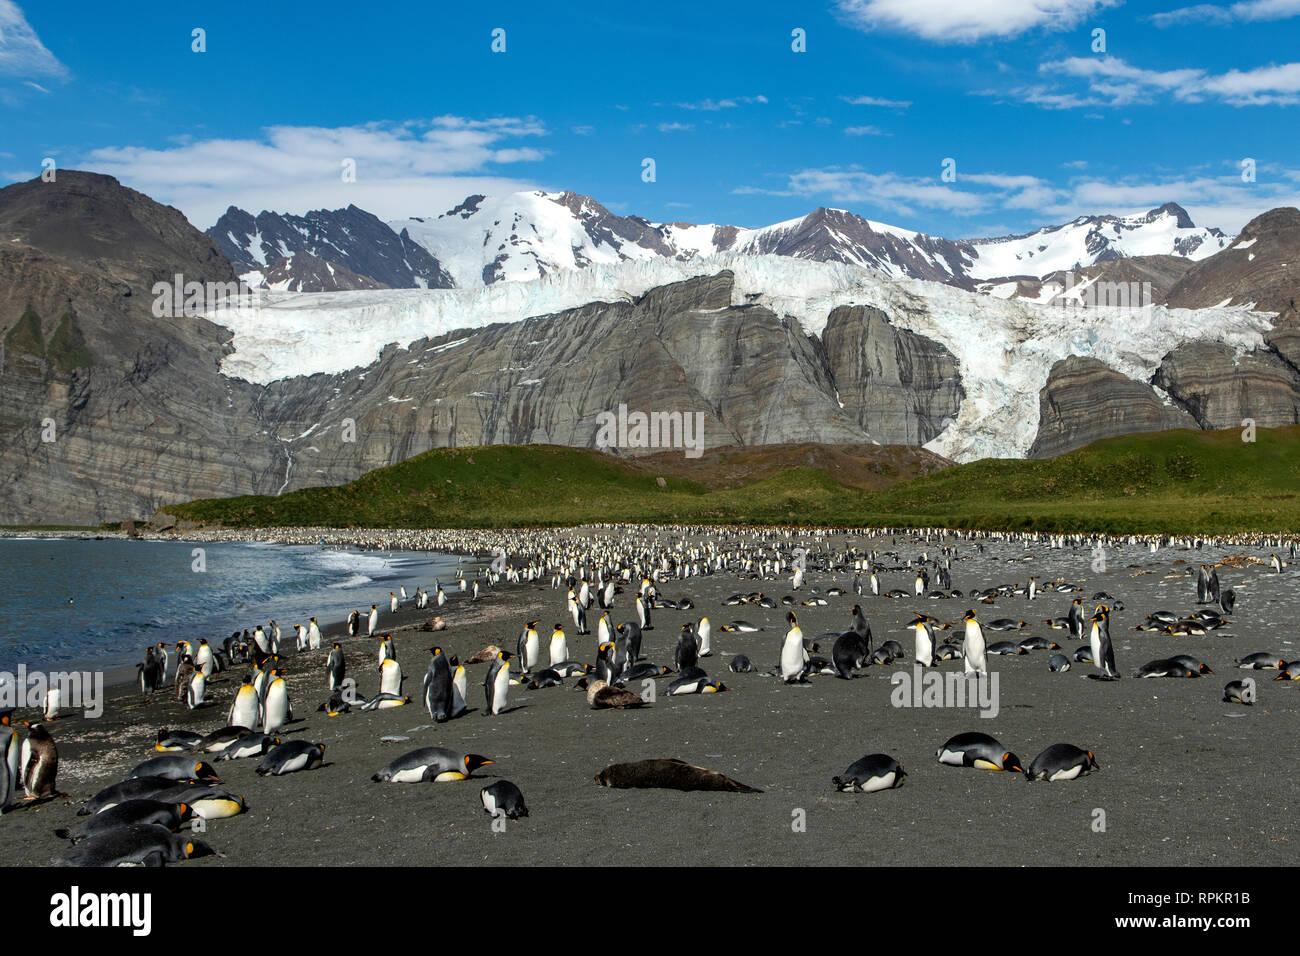 Bertrab Glacier, Gold Harbour, South Georgia - Stock Image